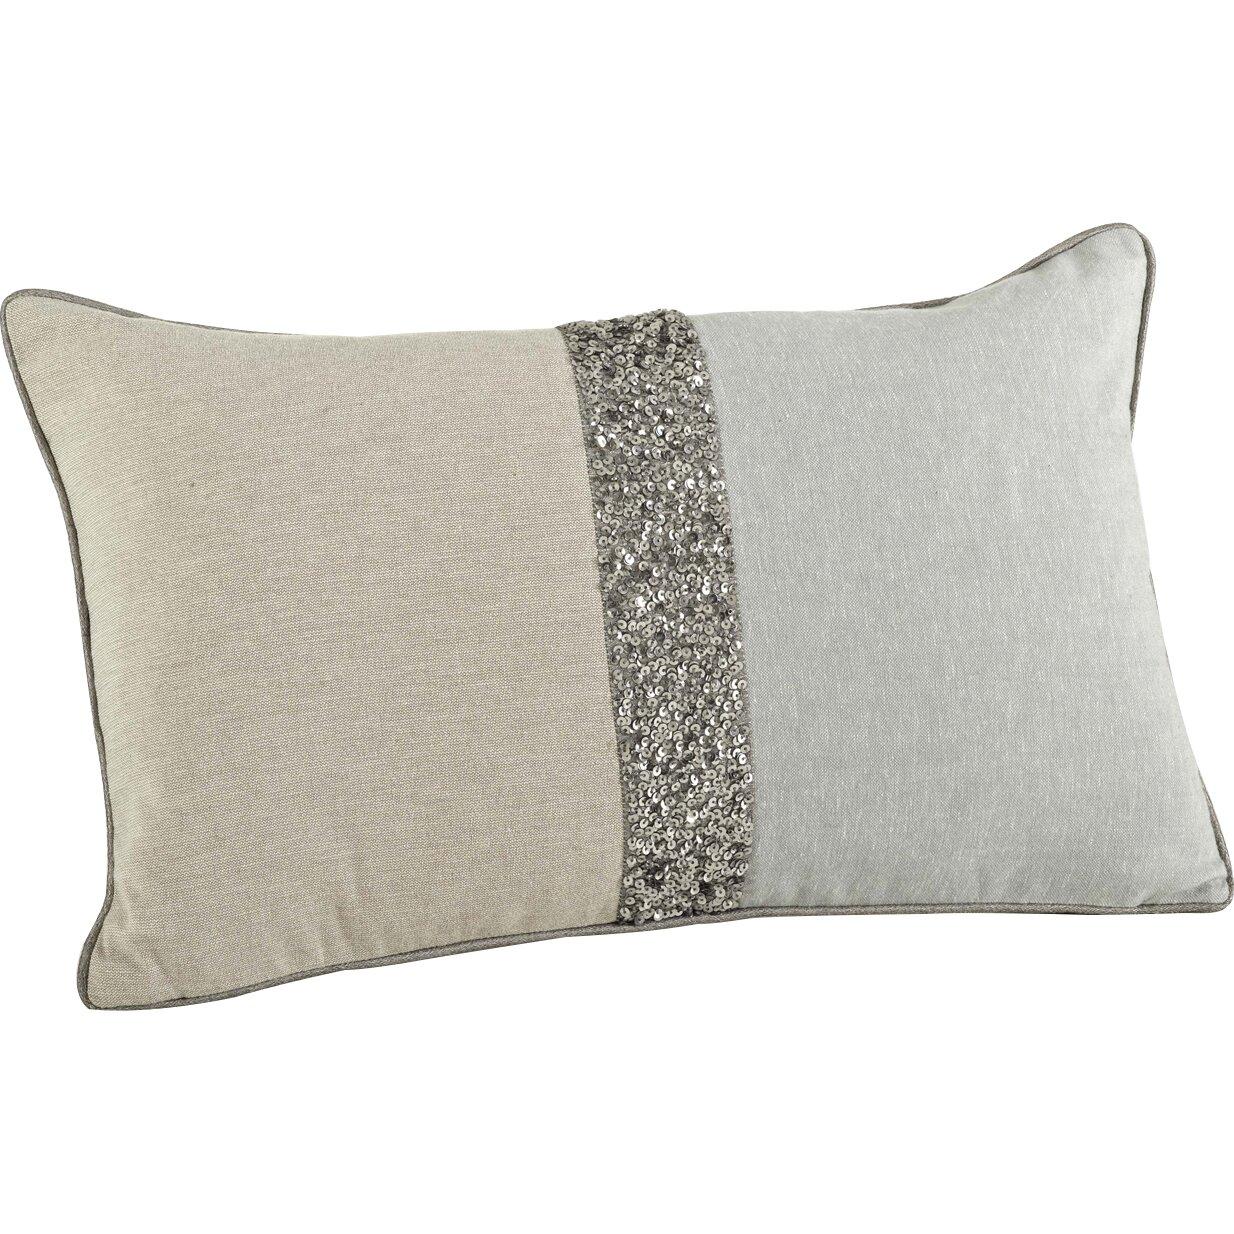 Decorative Pillows With Beading : Saro The Posh 2 Tone Beaded Cotton Throw Pillow & Reviews Wayfair